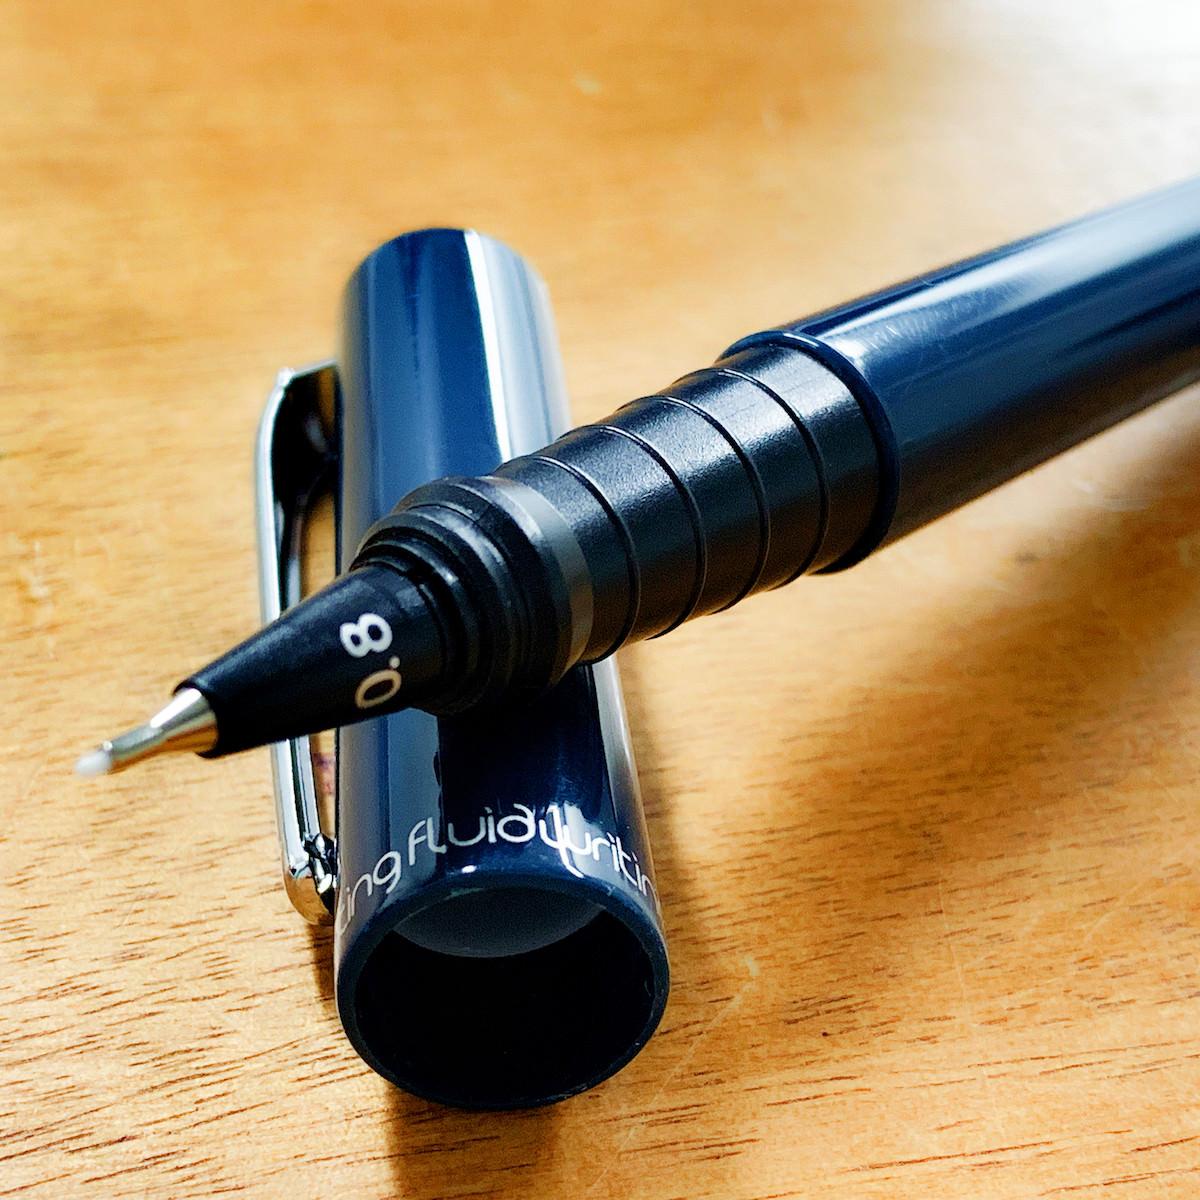 felt-pen-fluidwriting_4